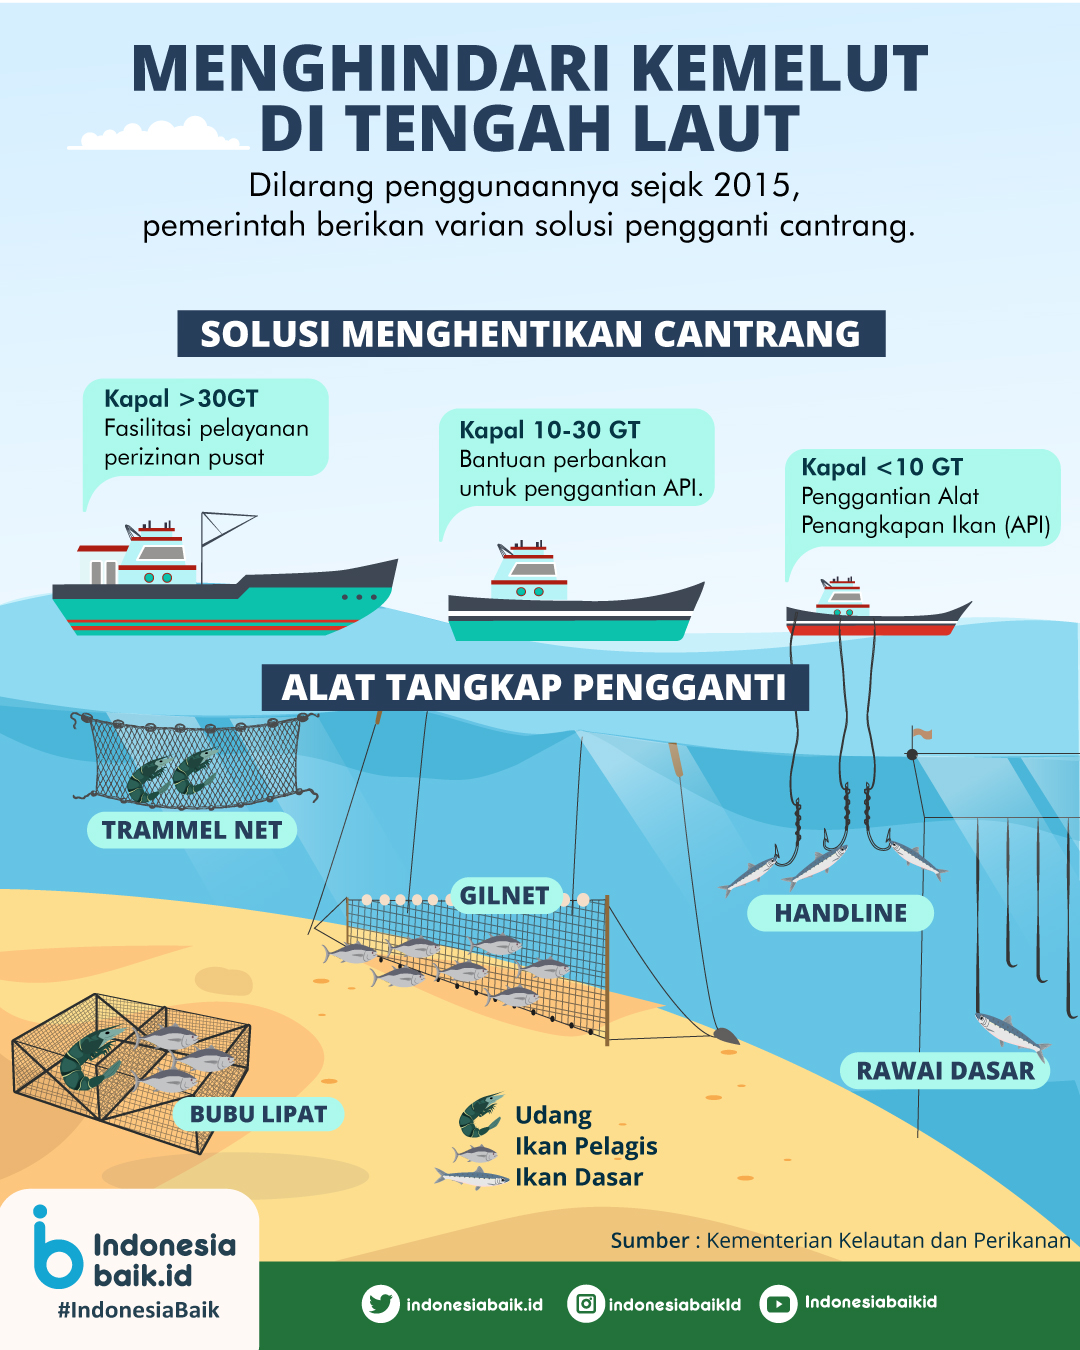 Menghindari Kemelut di Laut